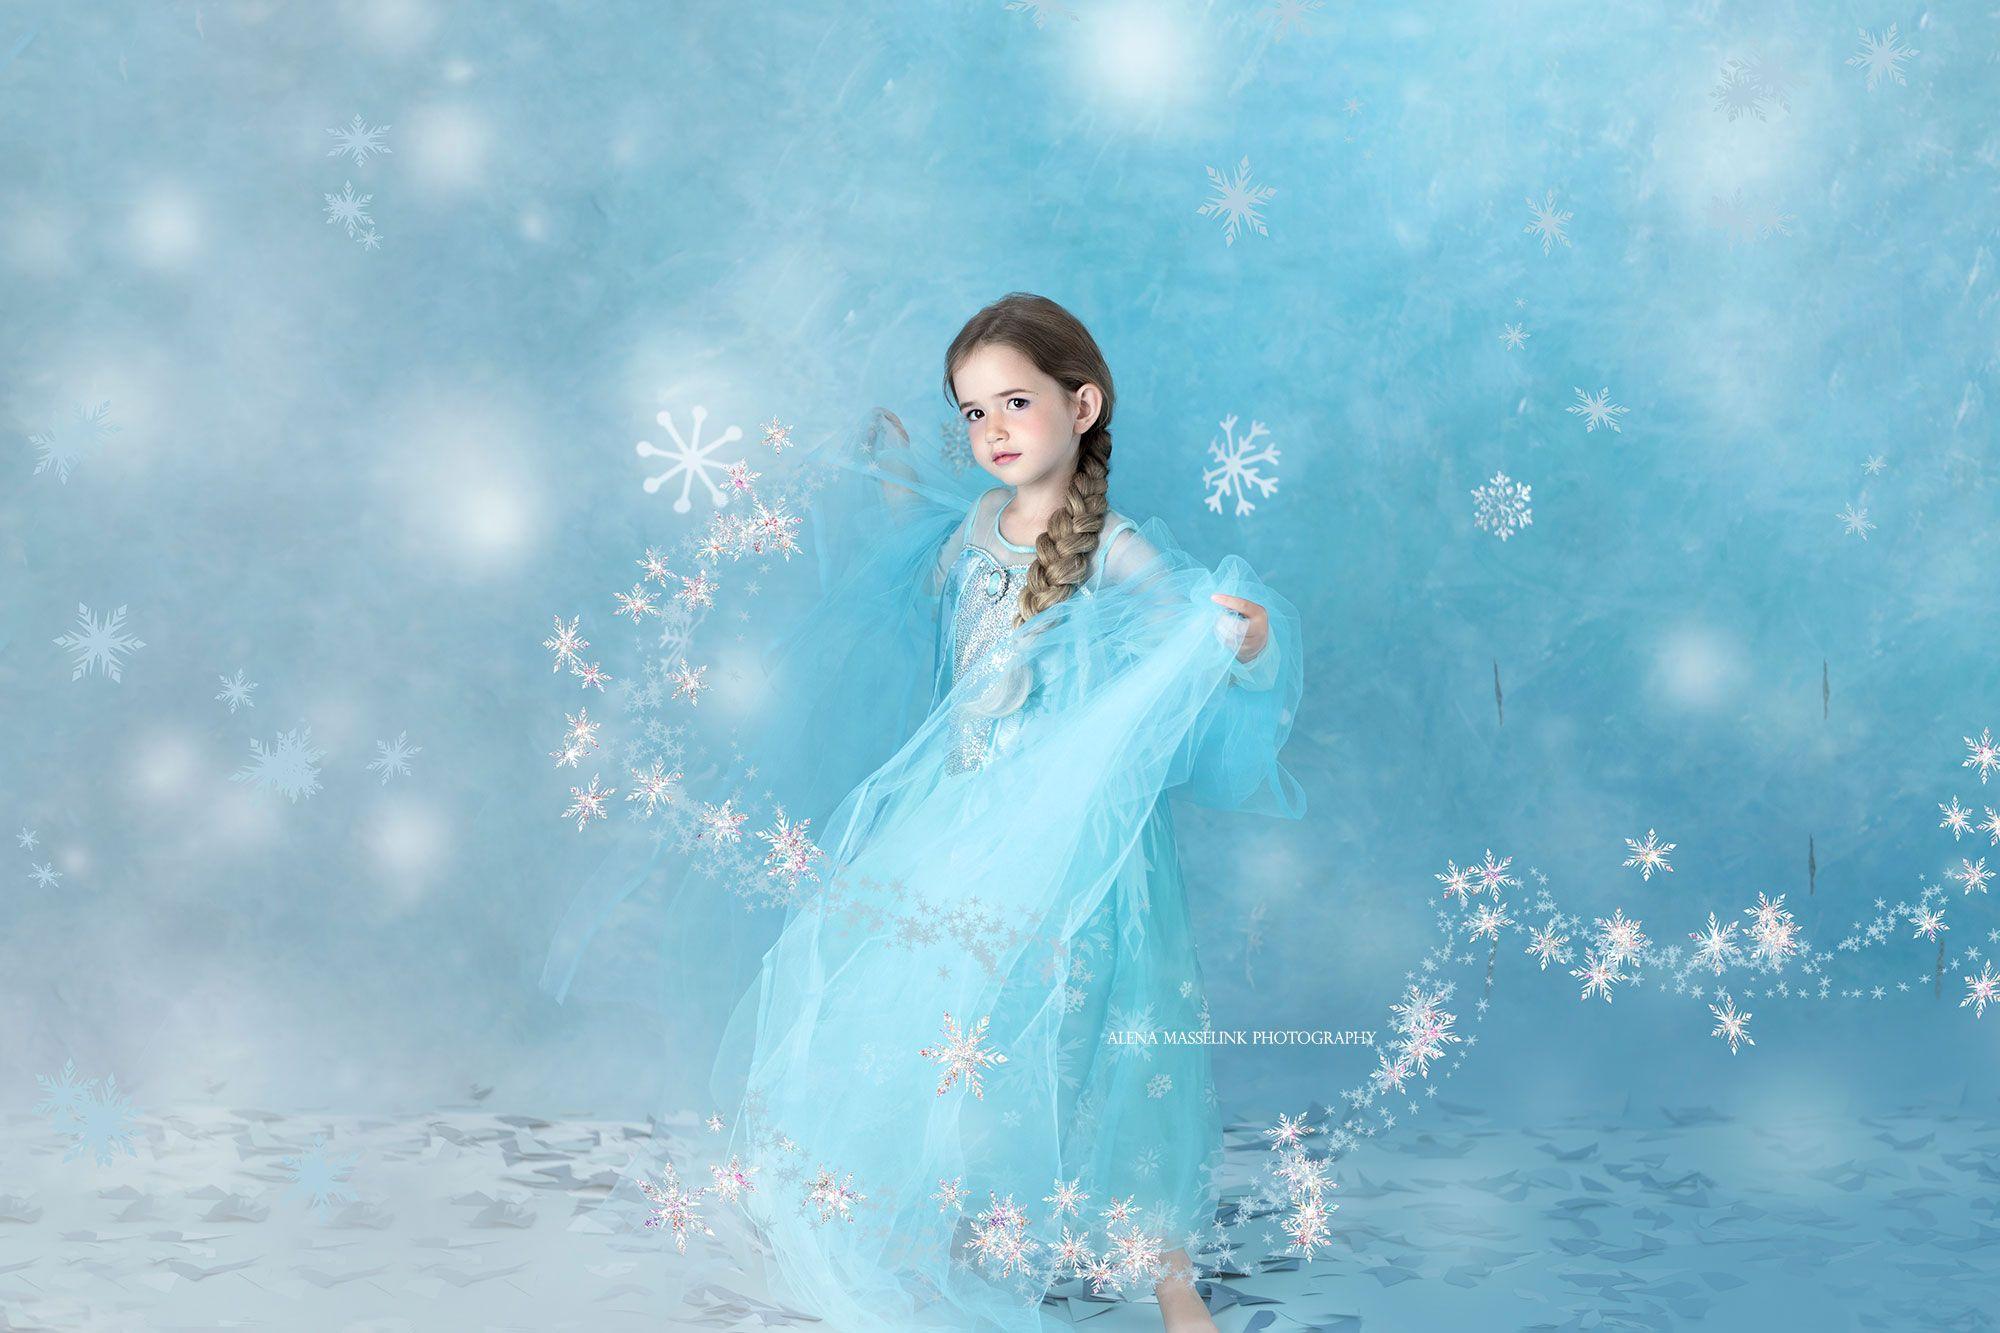 Frozen photoshoot/ Frozen/ Dancing Frozen  #frozen #frozendisney #elsa #disneyfrozen #disney #anna #frozenfever #olaf #frozenparty #queenelsa #disneyland #disneyprincess #frozenmovie #elsafrozen #letitgo #olaffrozen #frozencake #annafrozen #queenanna #queen #frozenfeverelsa #frozenelsa #princess  #princesses #olafsfrozenadventure #disneyphotography #freeze